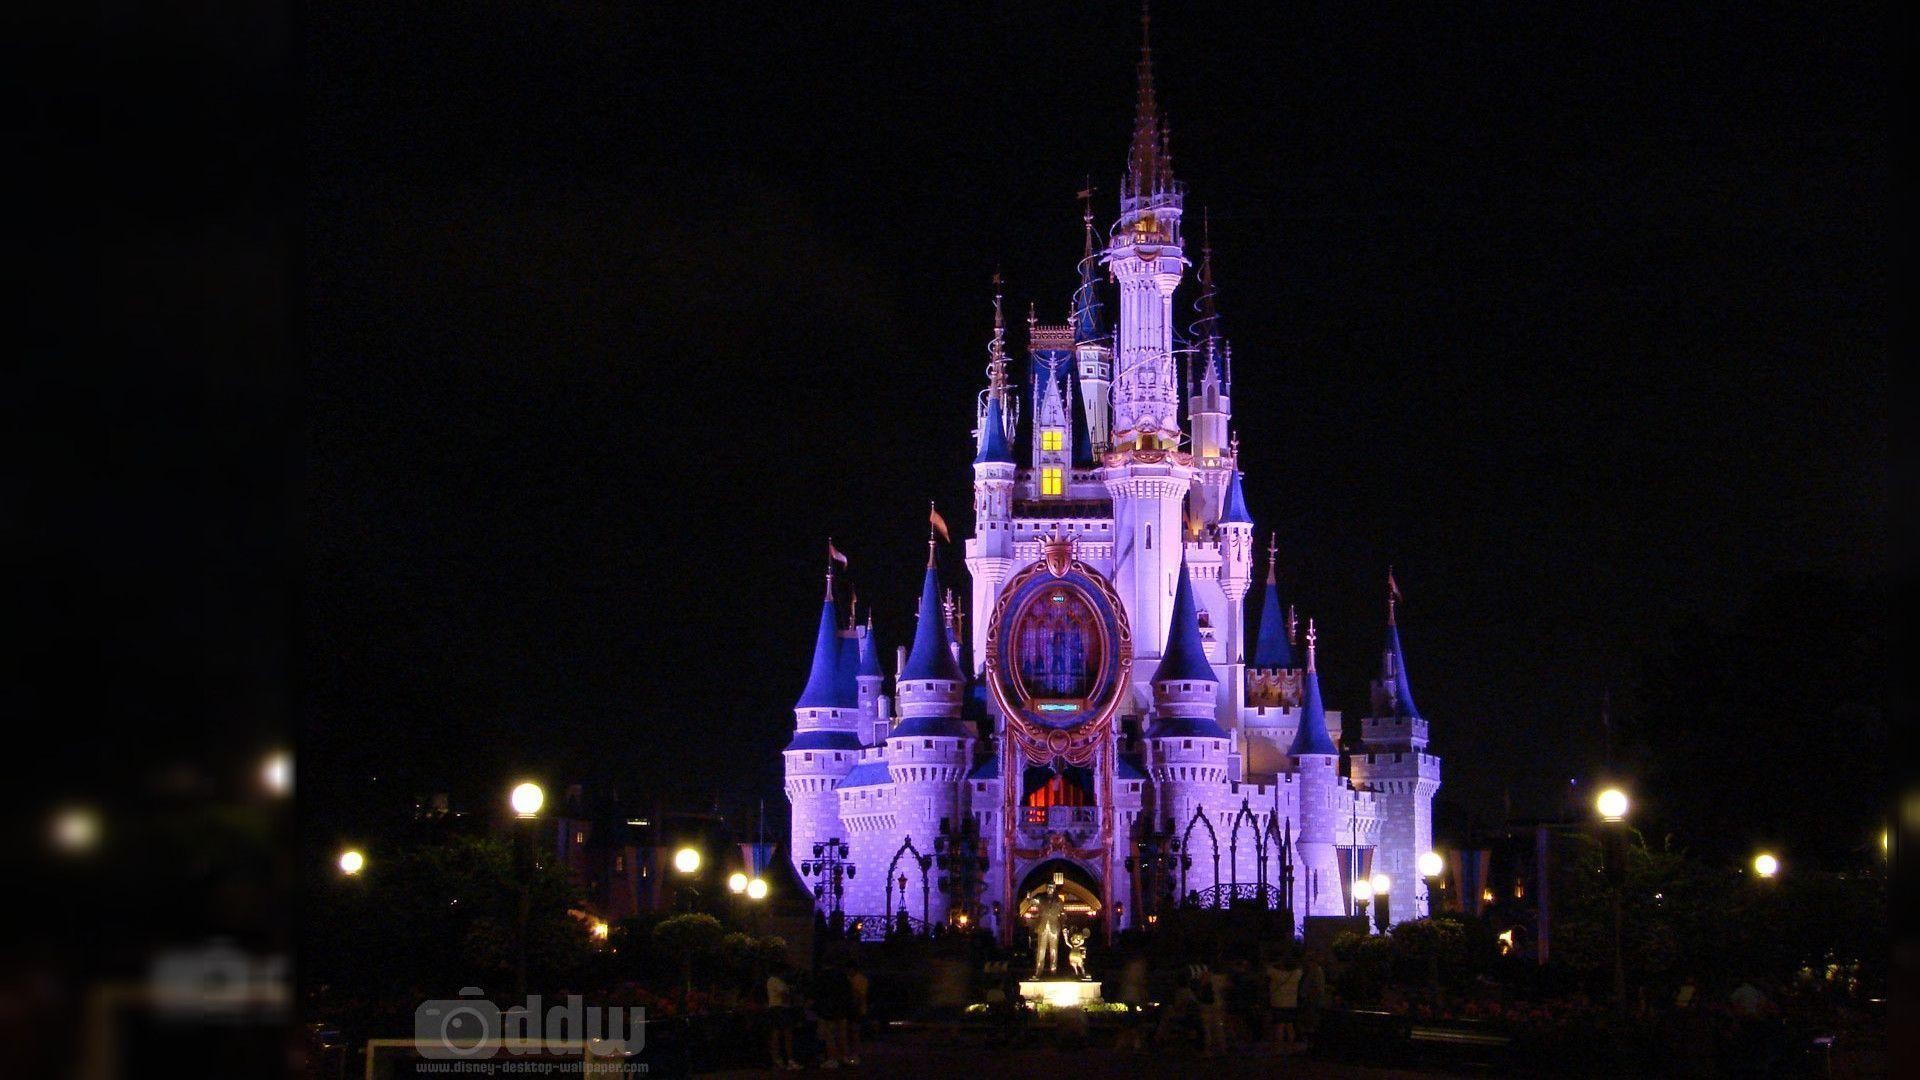 Disney castle wallpaper hd 72 images - Cute disney hd wallpapers ...